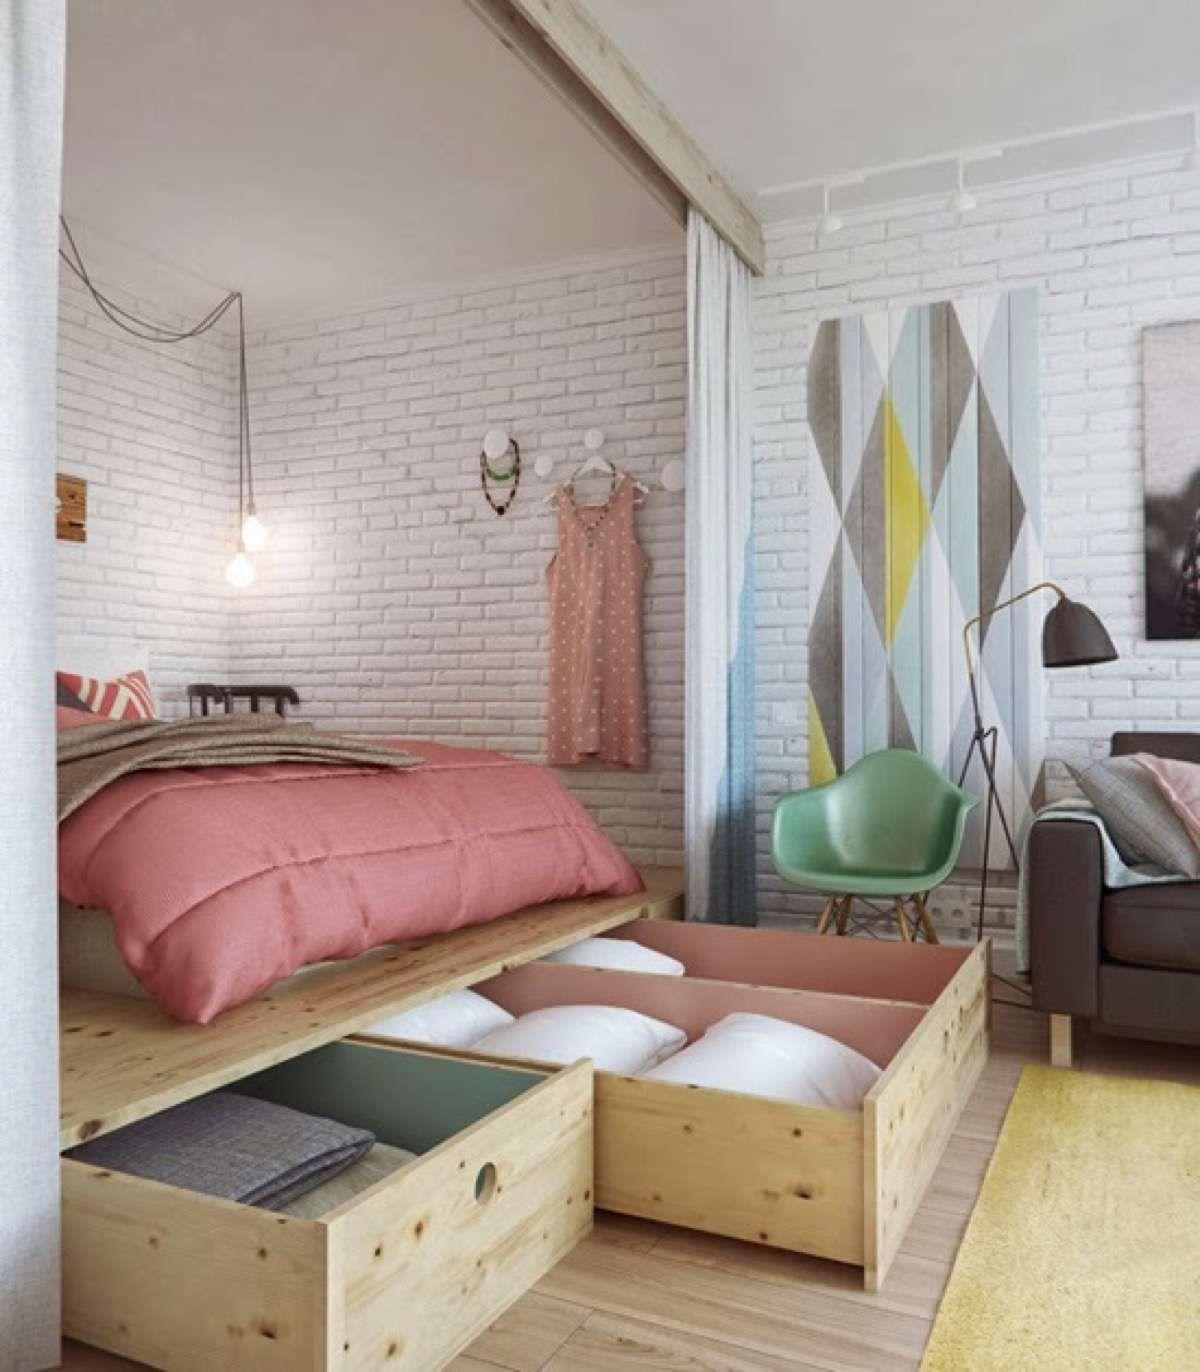 Decorar un piso antiguo excellent decorar con muebles for Decorar piso antiguo